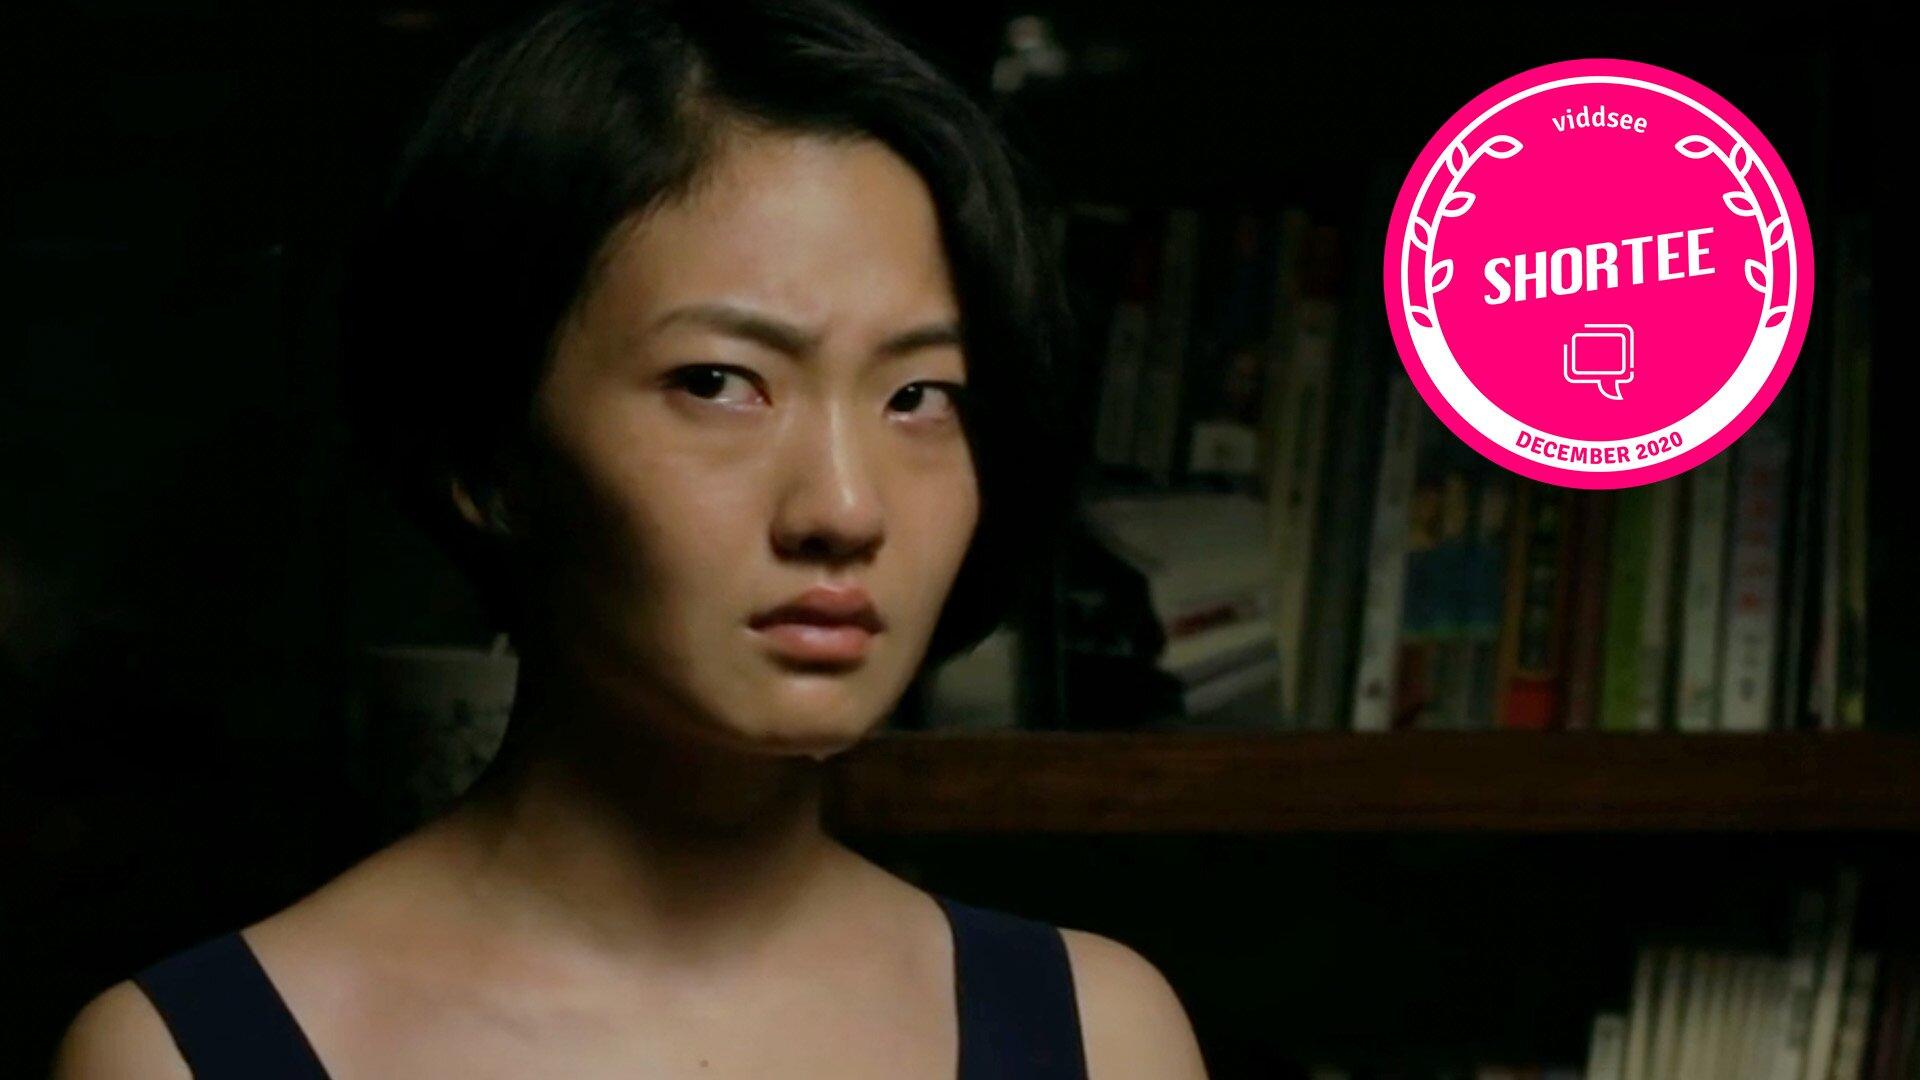 Home 家 By Athena Han Taiwan Canada Drama Short Film Viddsee